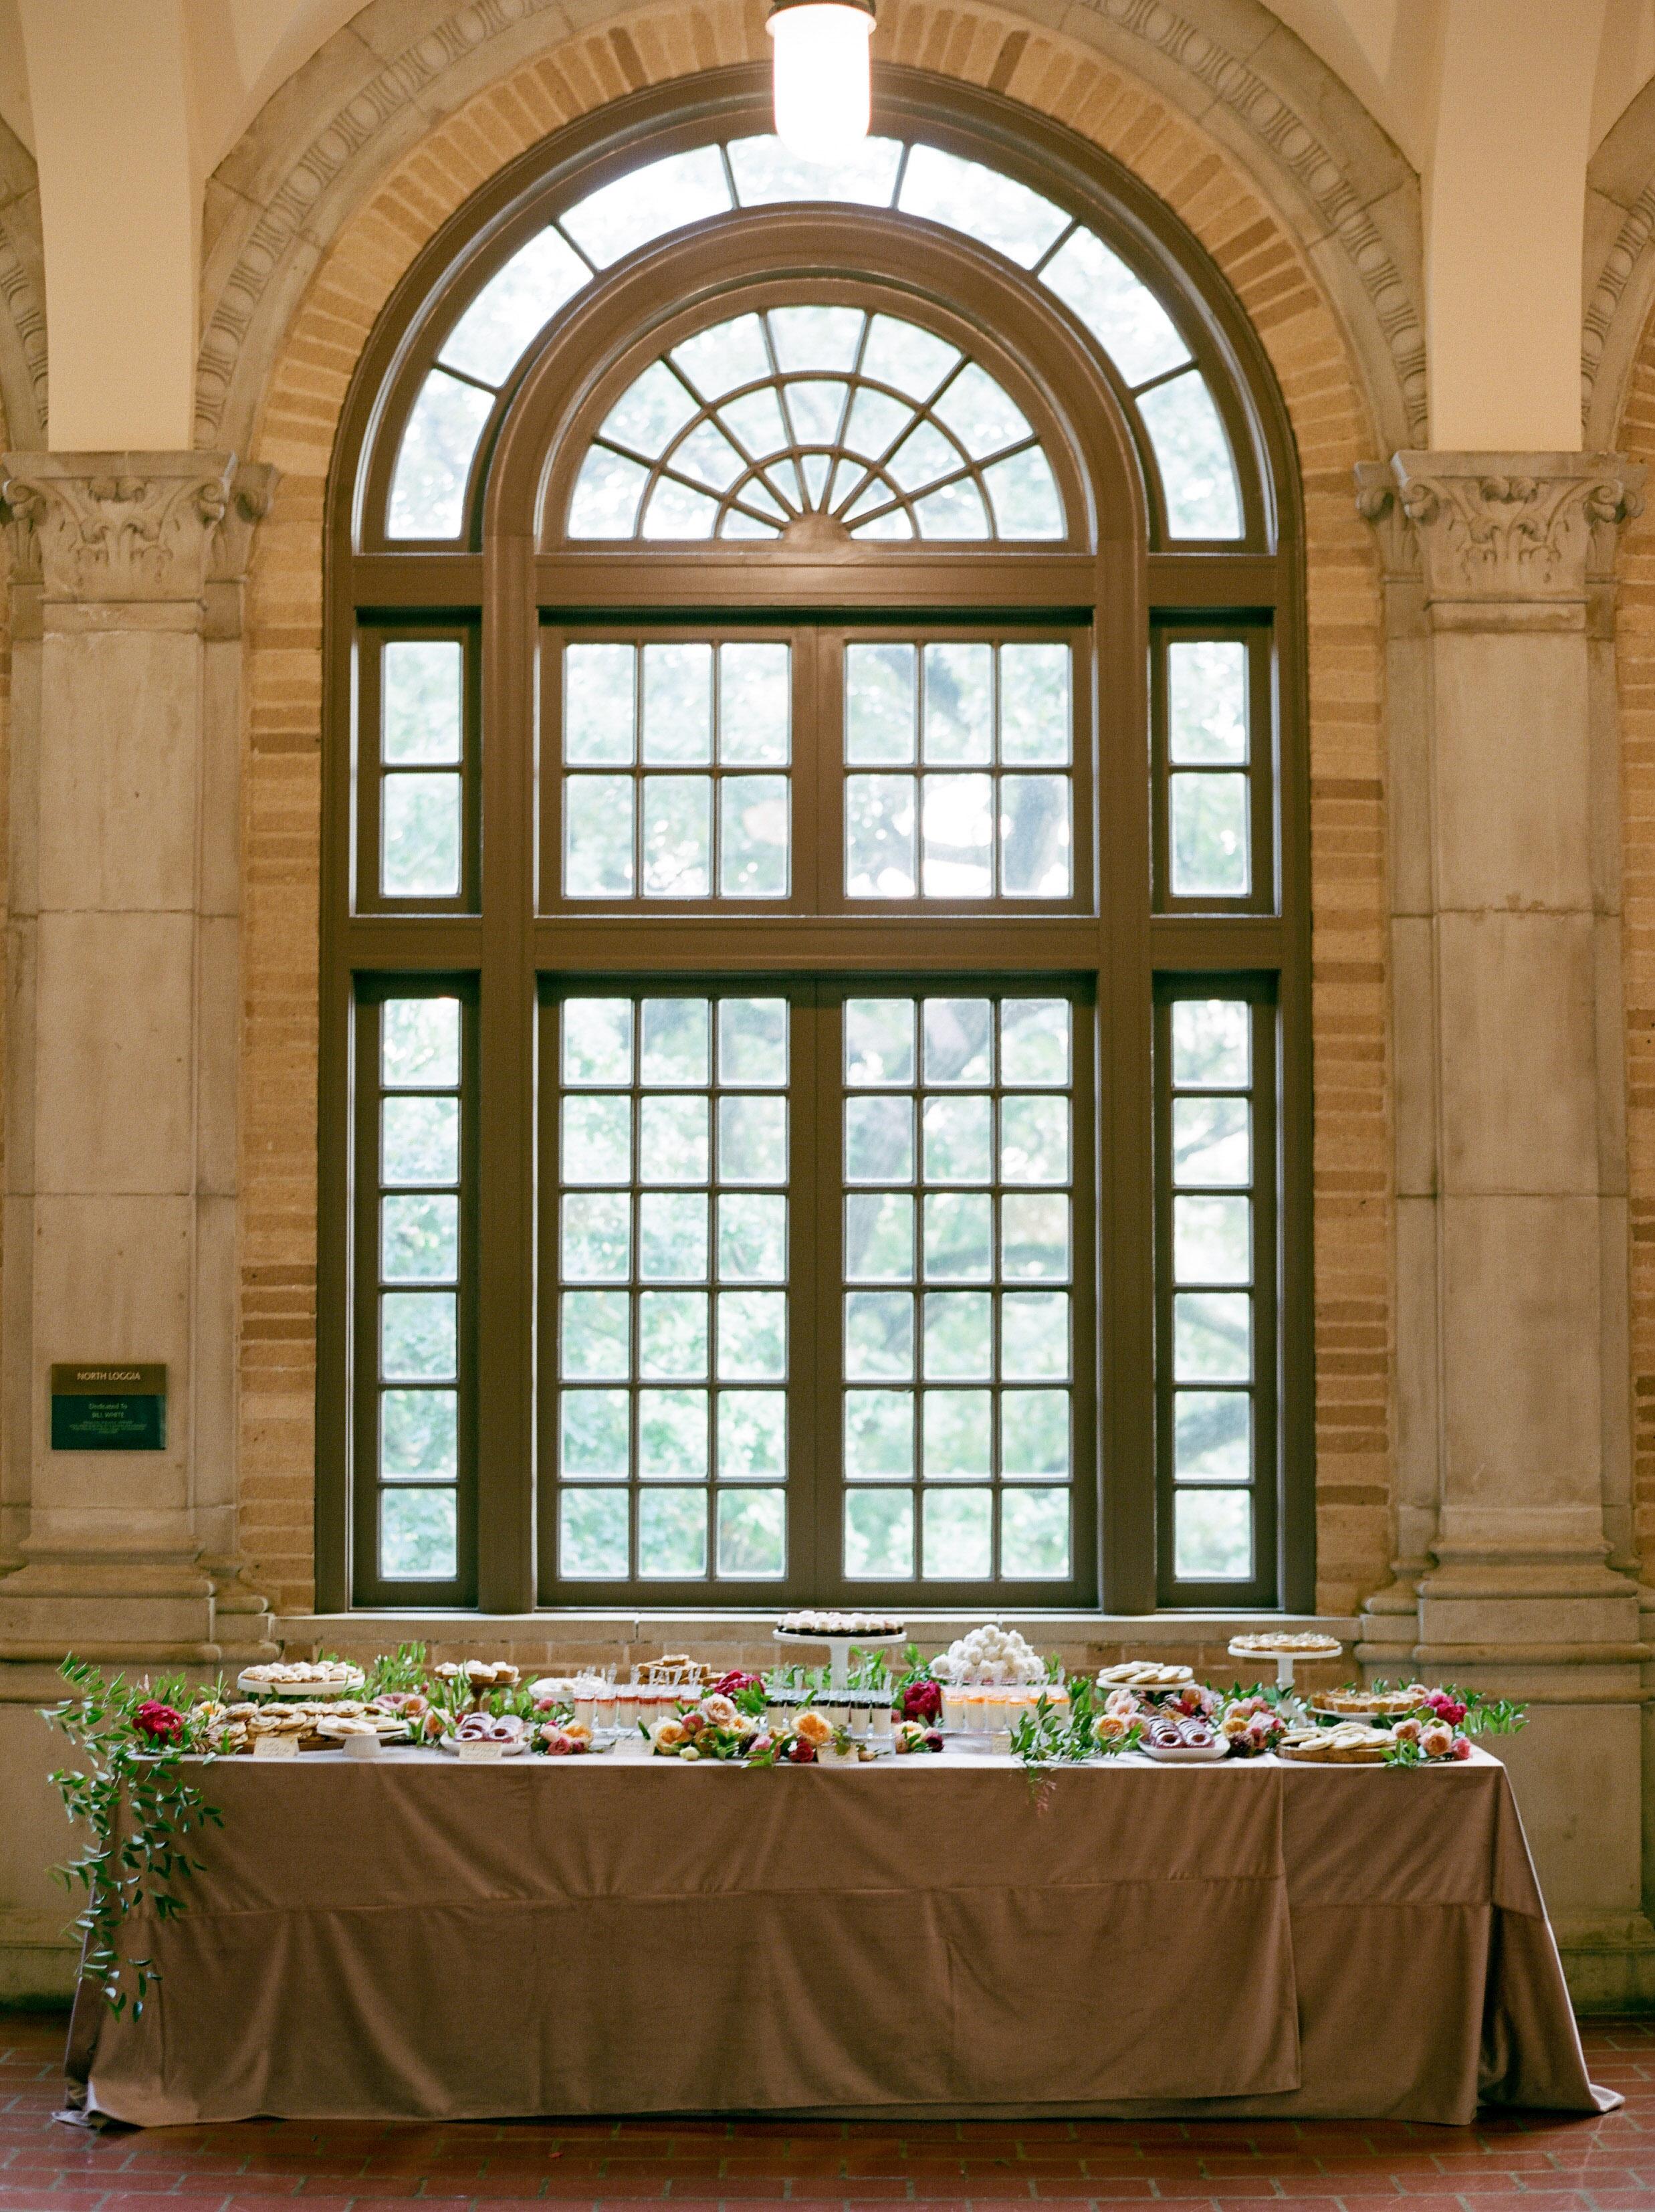 The-Knot-Texas-Fine-Art-Wedding-Film-Destination-Photographer-Houston-Austin-Dallas-New-Orleans-Julia-Ideson-Library-Event-Dana-Josh-Fernandez-Photograph-Top-Best-59.jpg